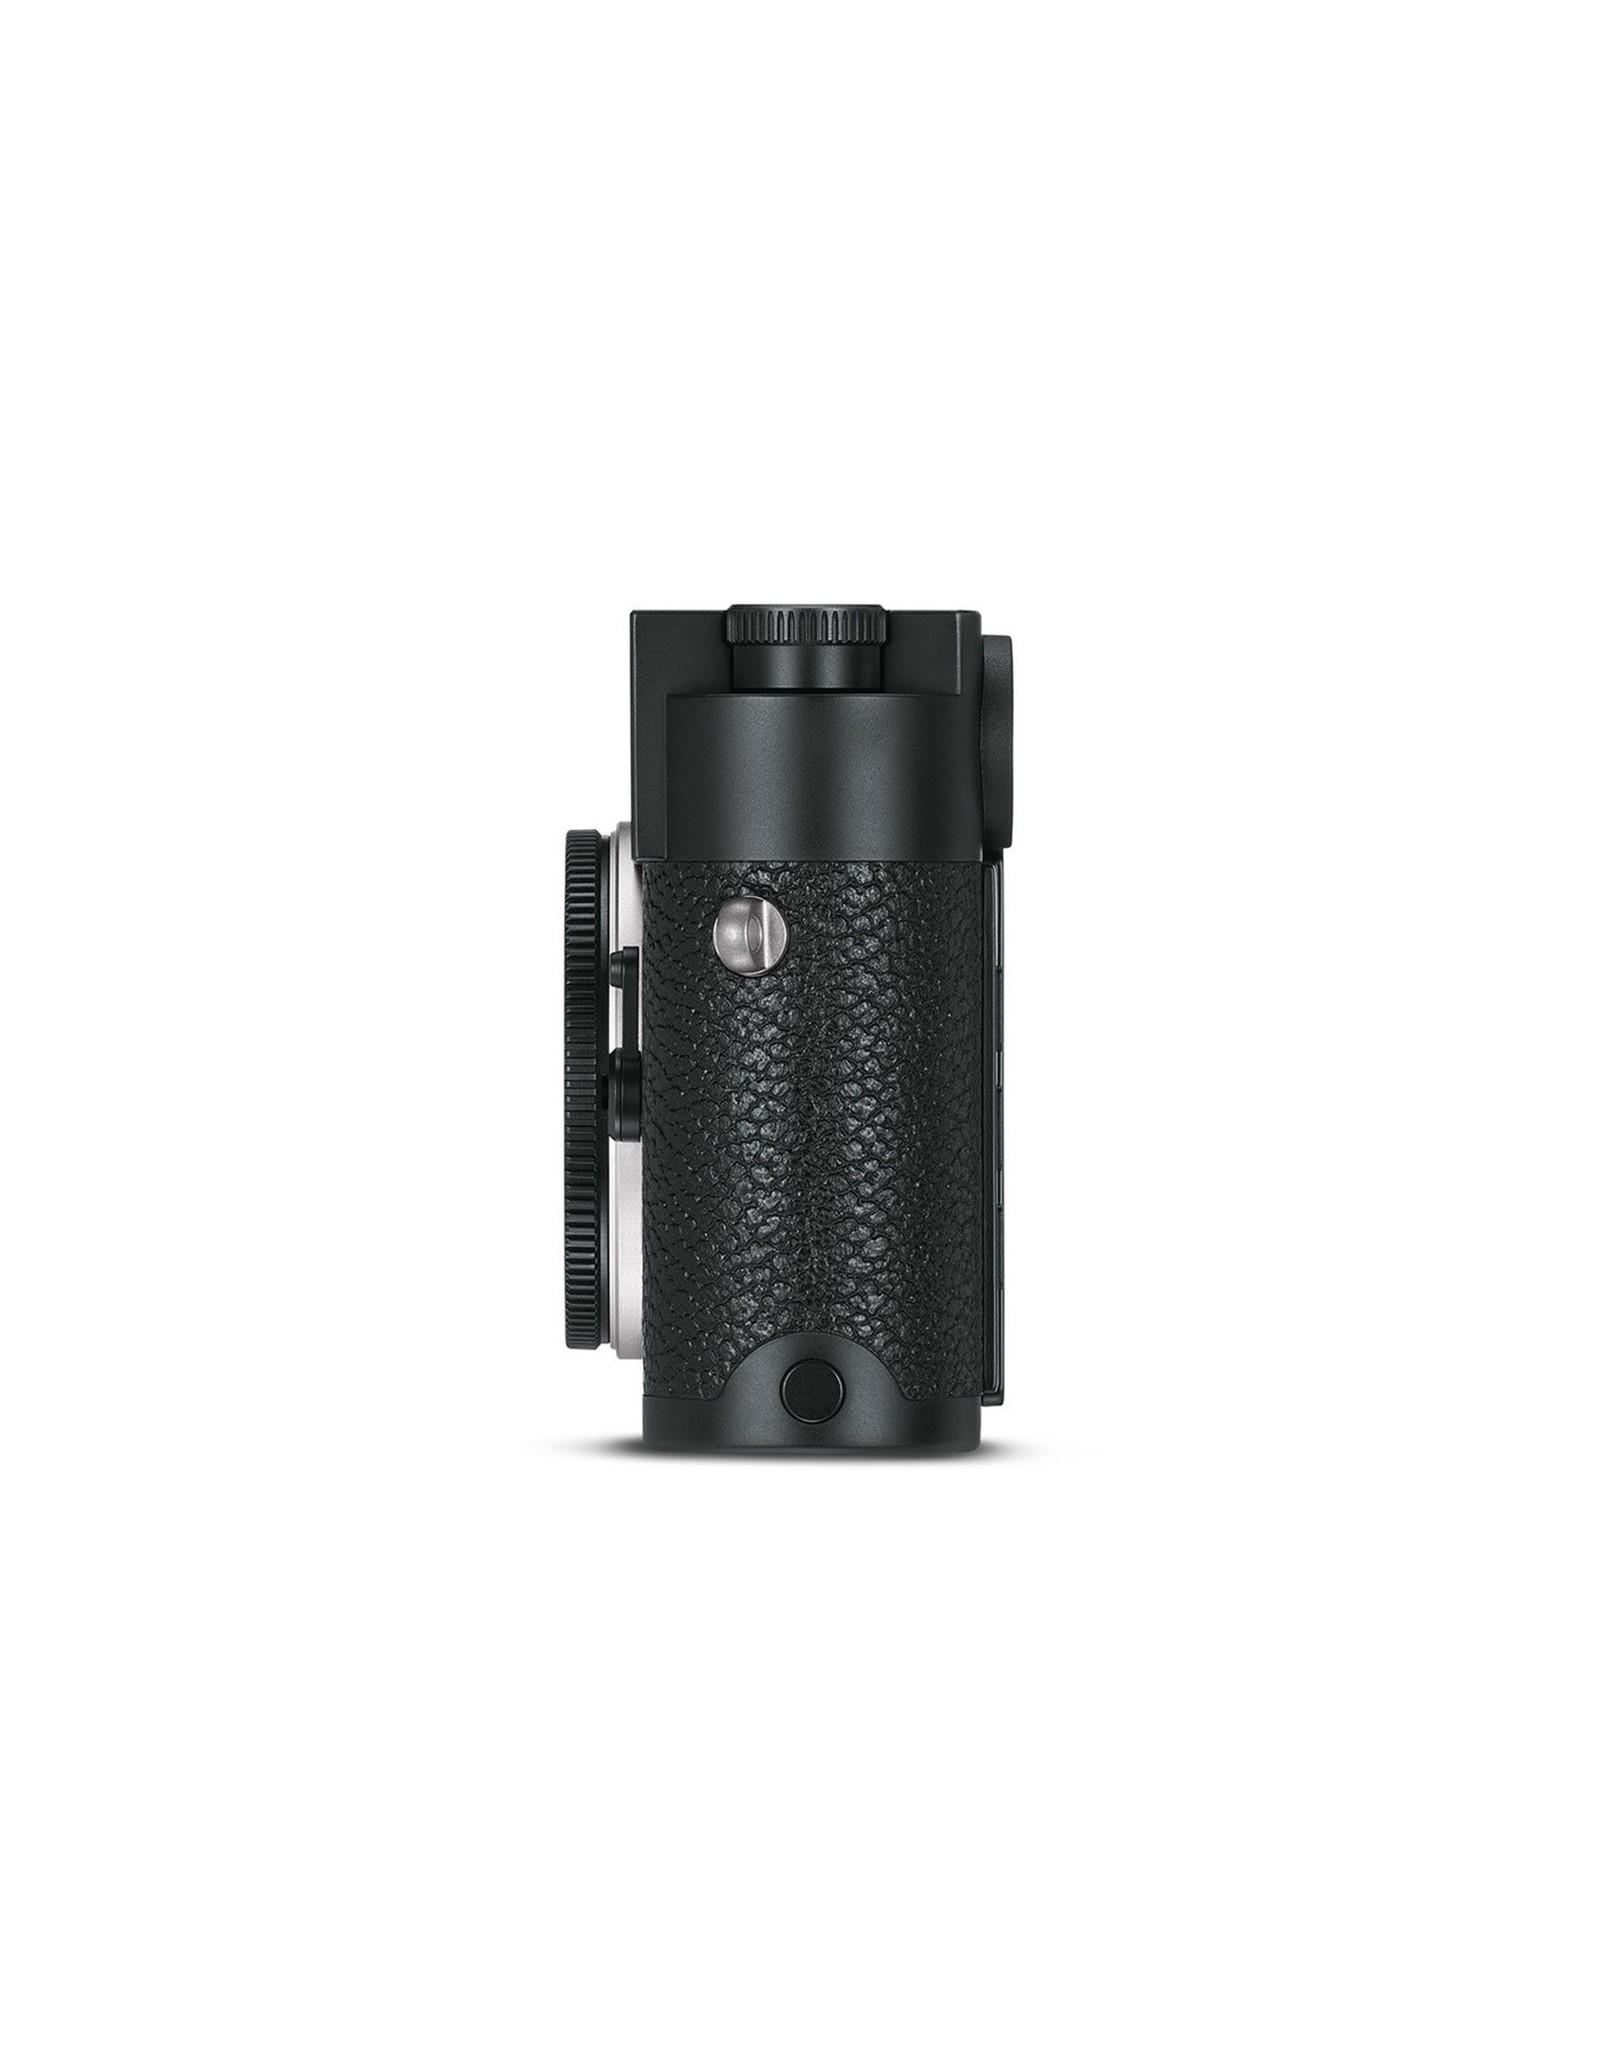 Leica Leica M10-P Black Chrome   200-21